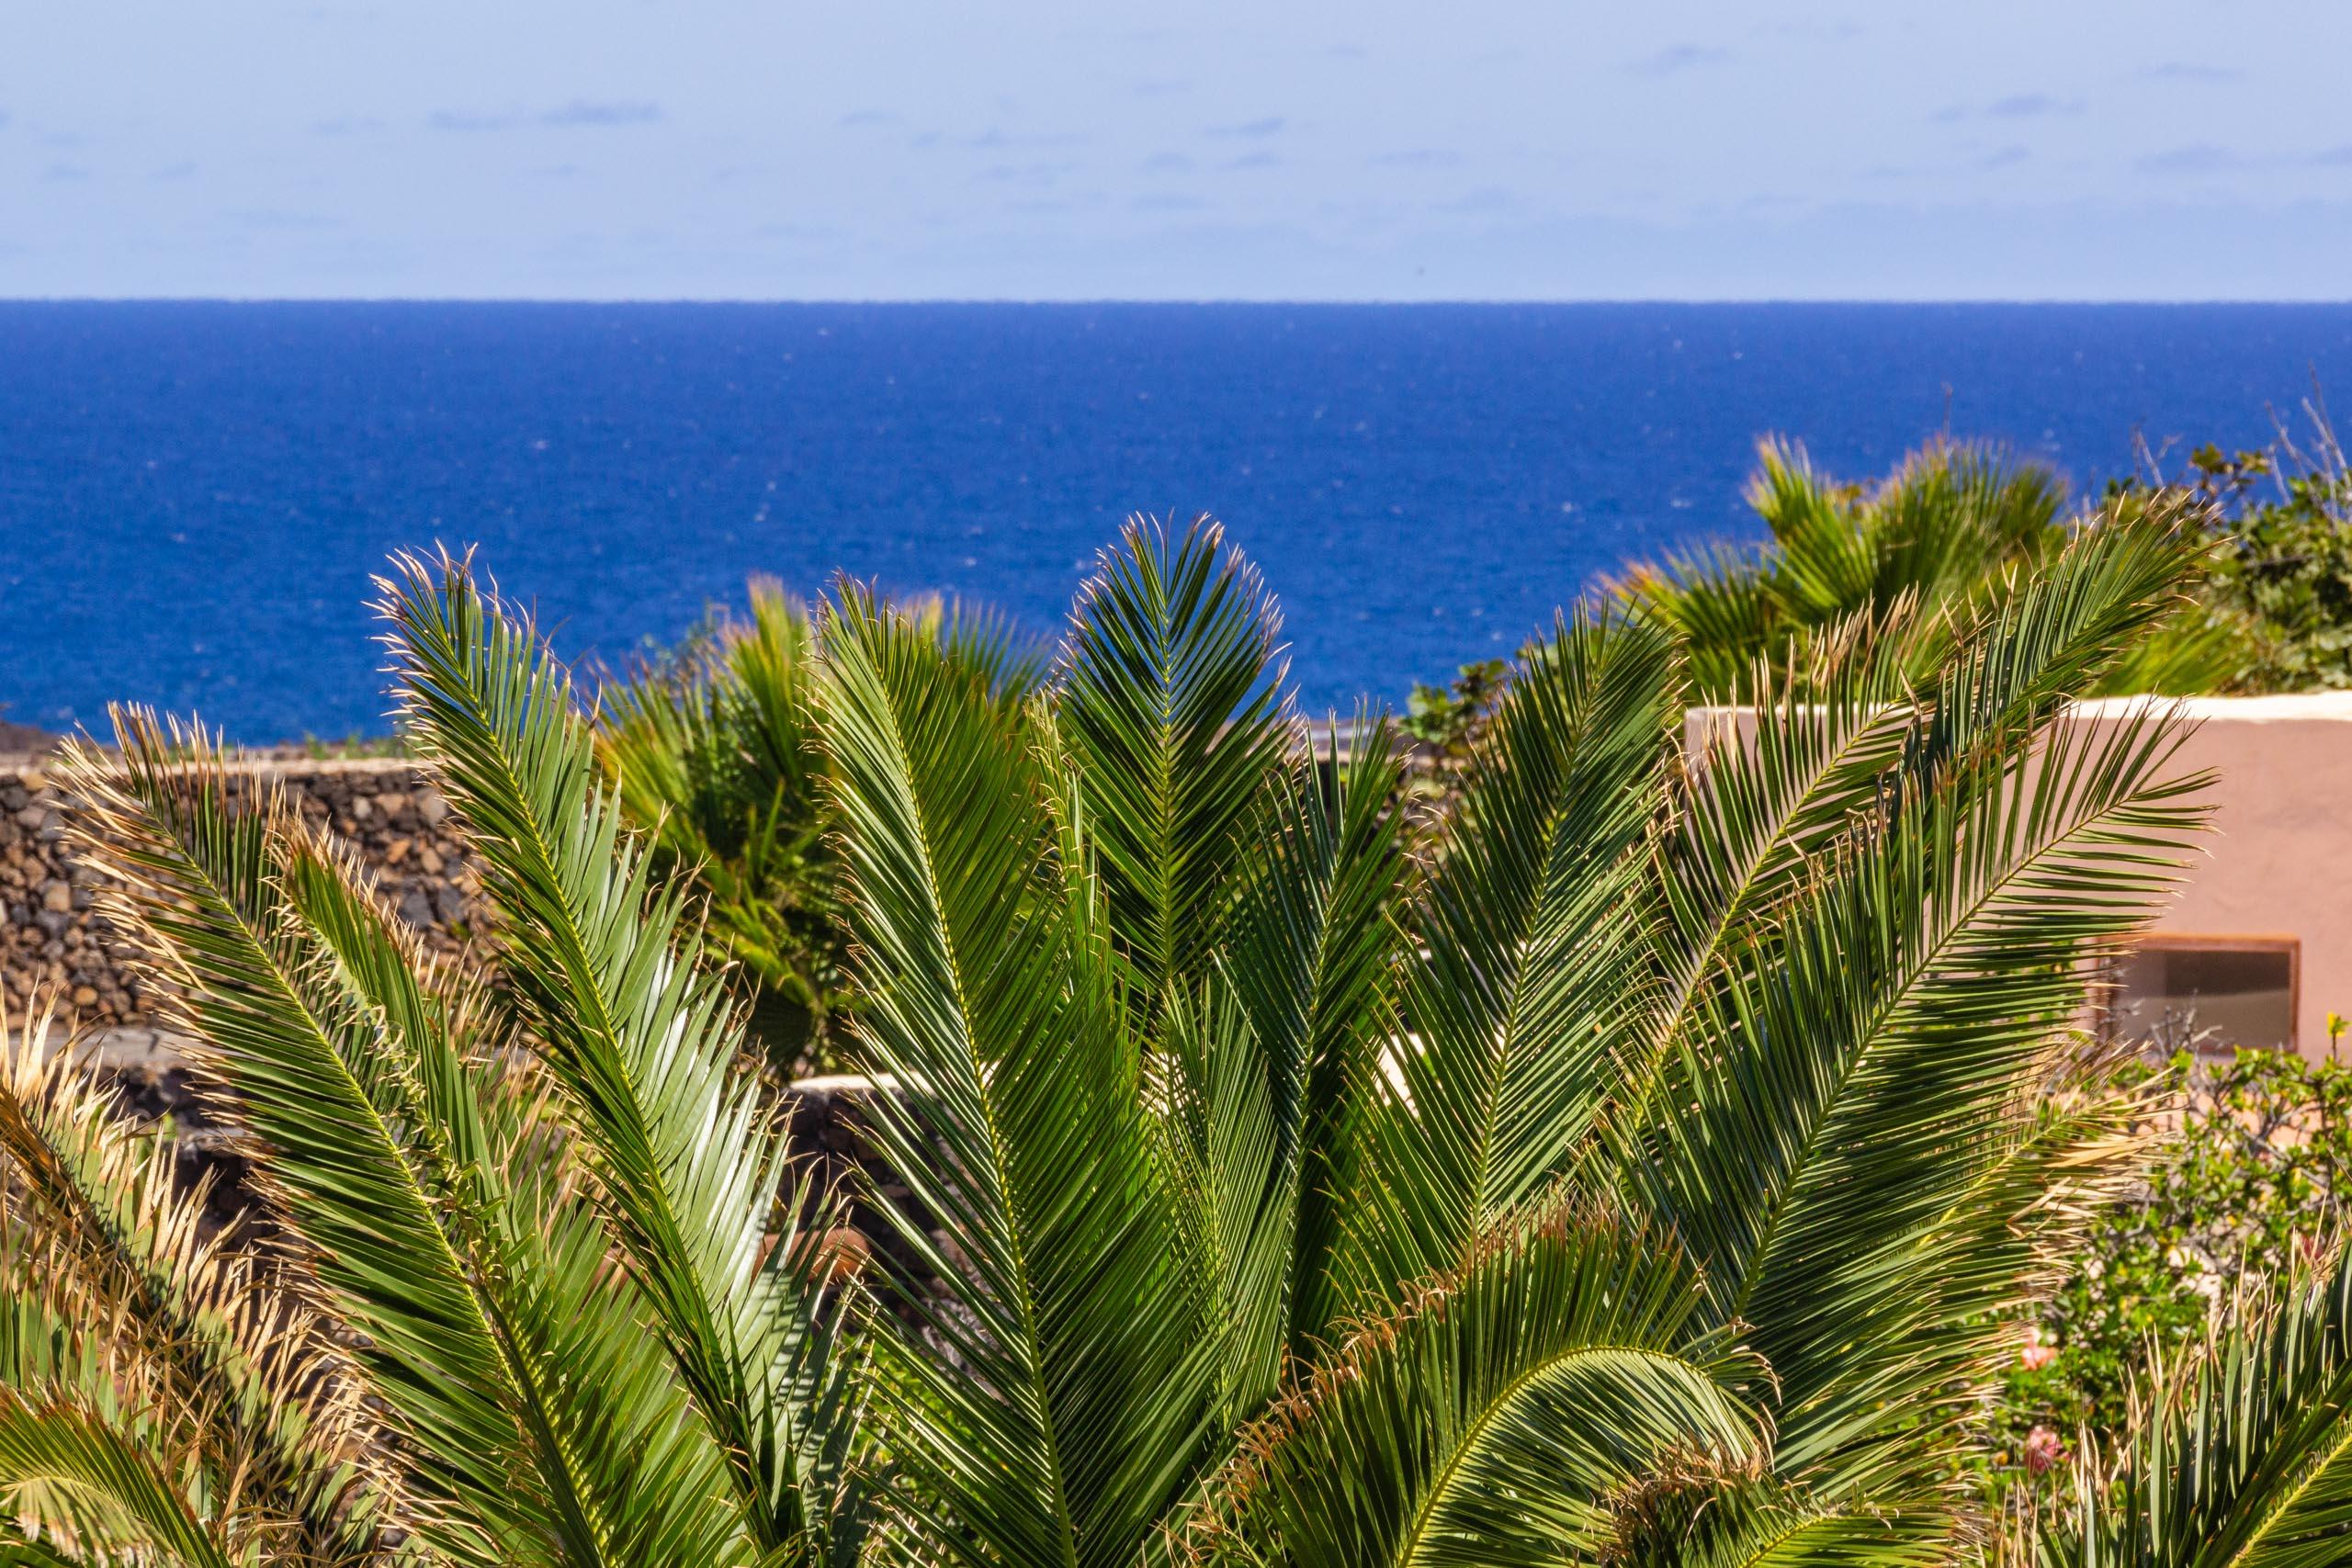 2016 09 Lanzarote GardenNeighbourhood 2 006